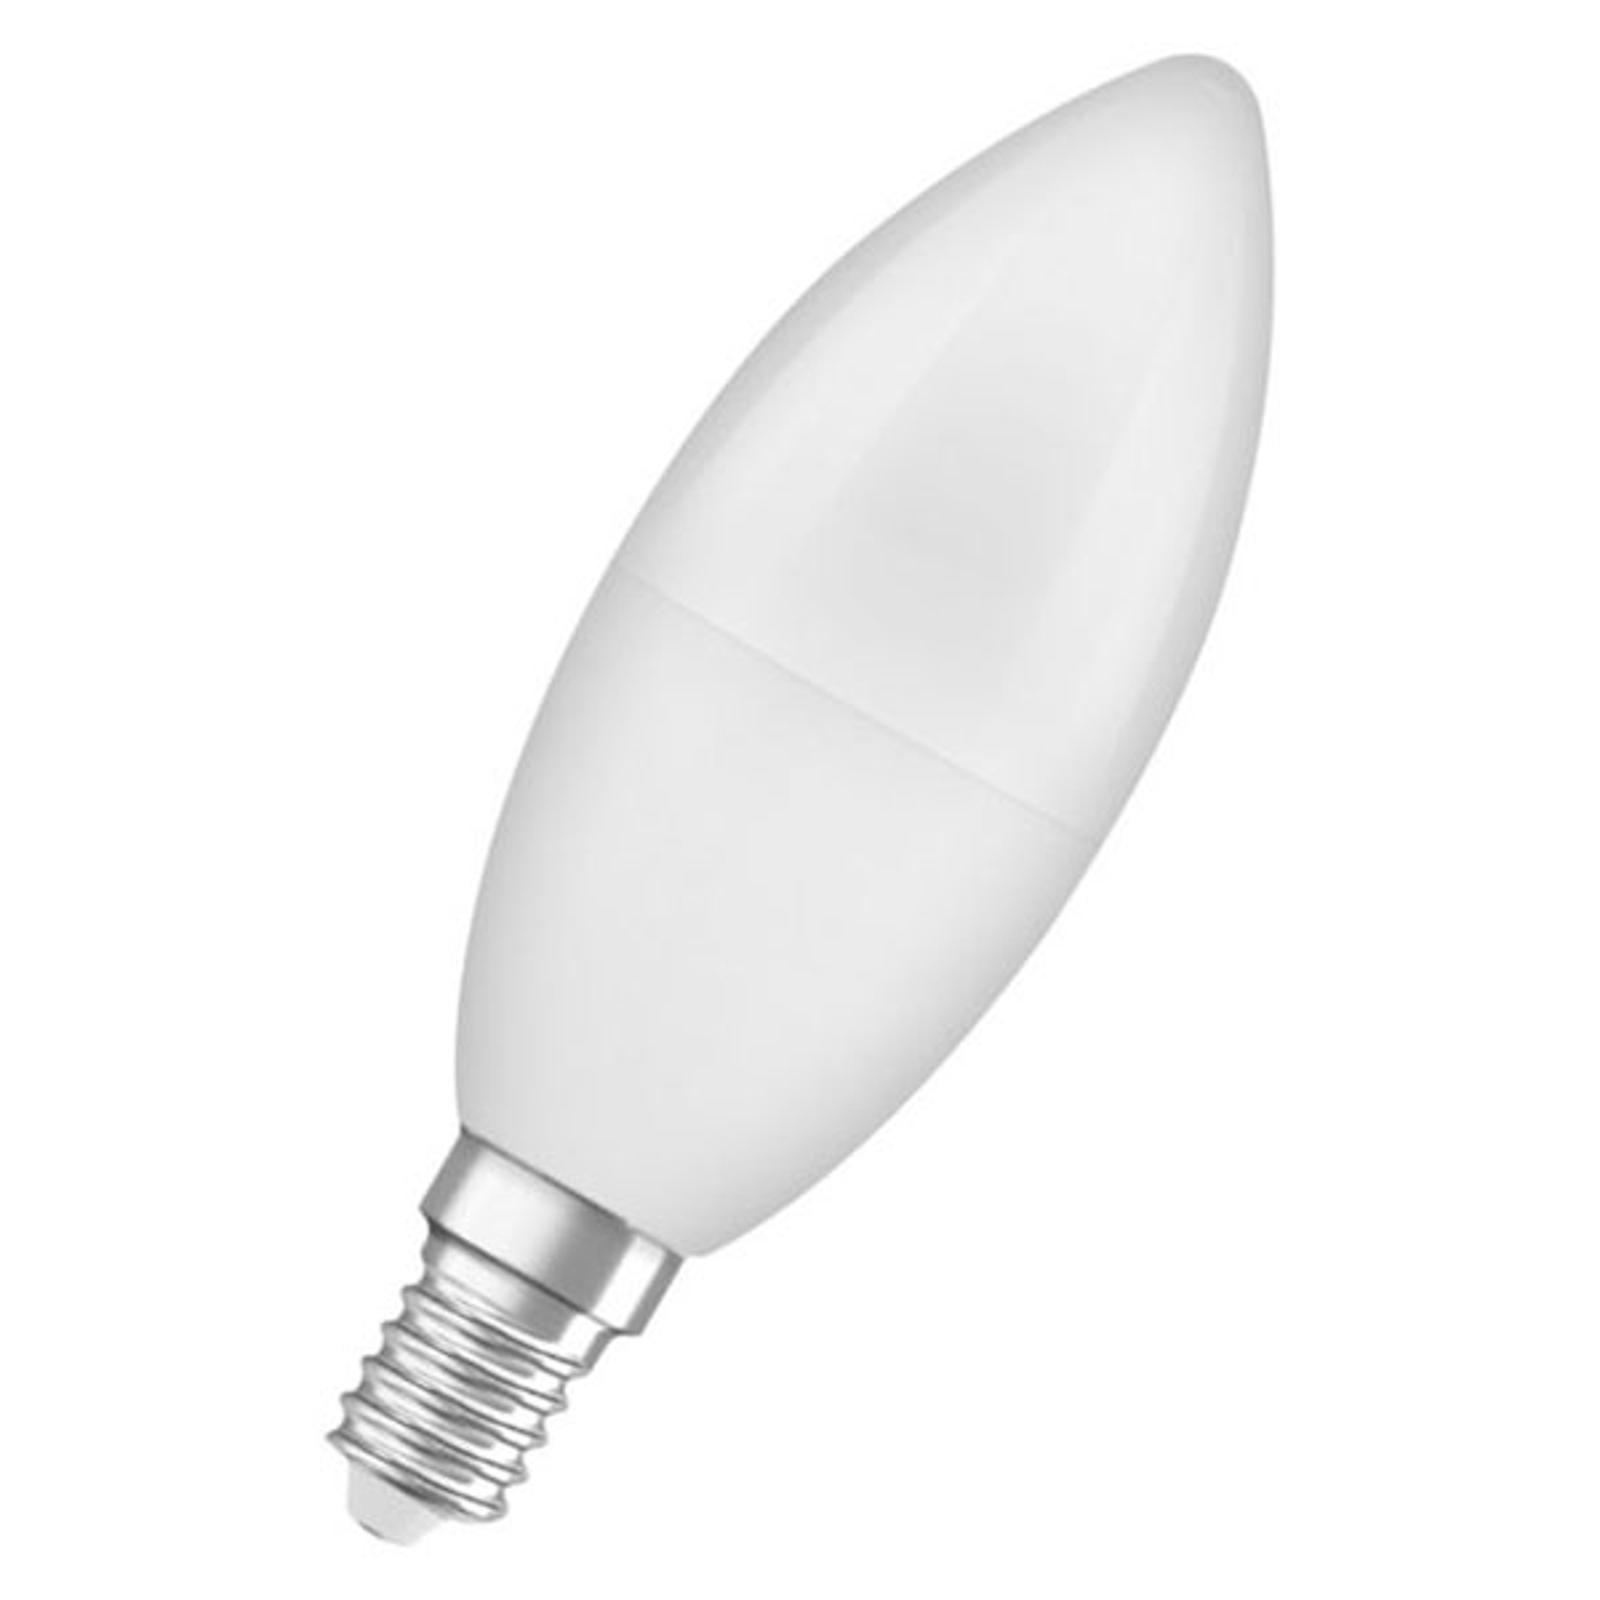 OSRAM Classic B LED-Lampe E14 7,5W 2.700K matt